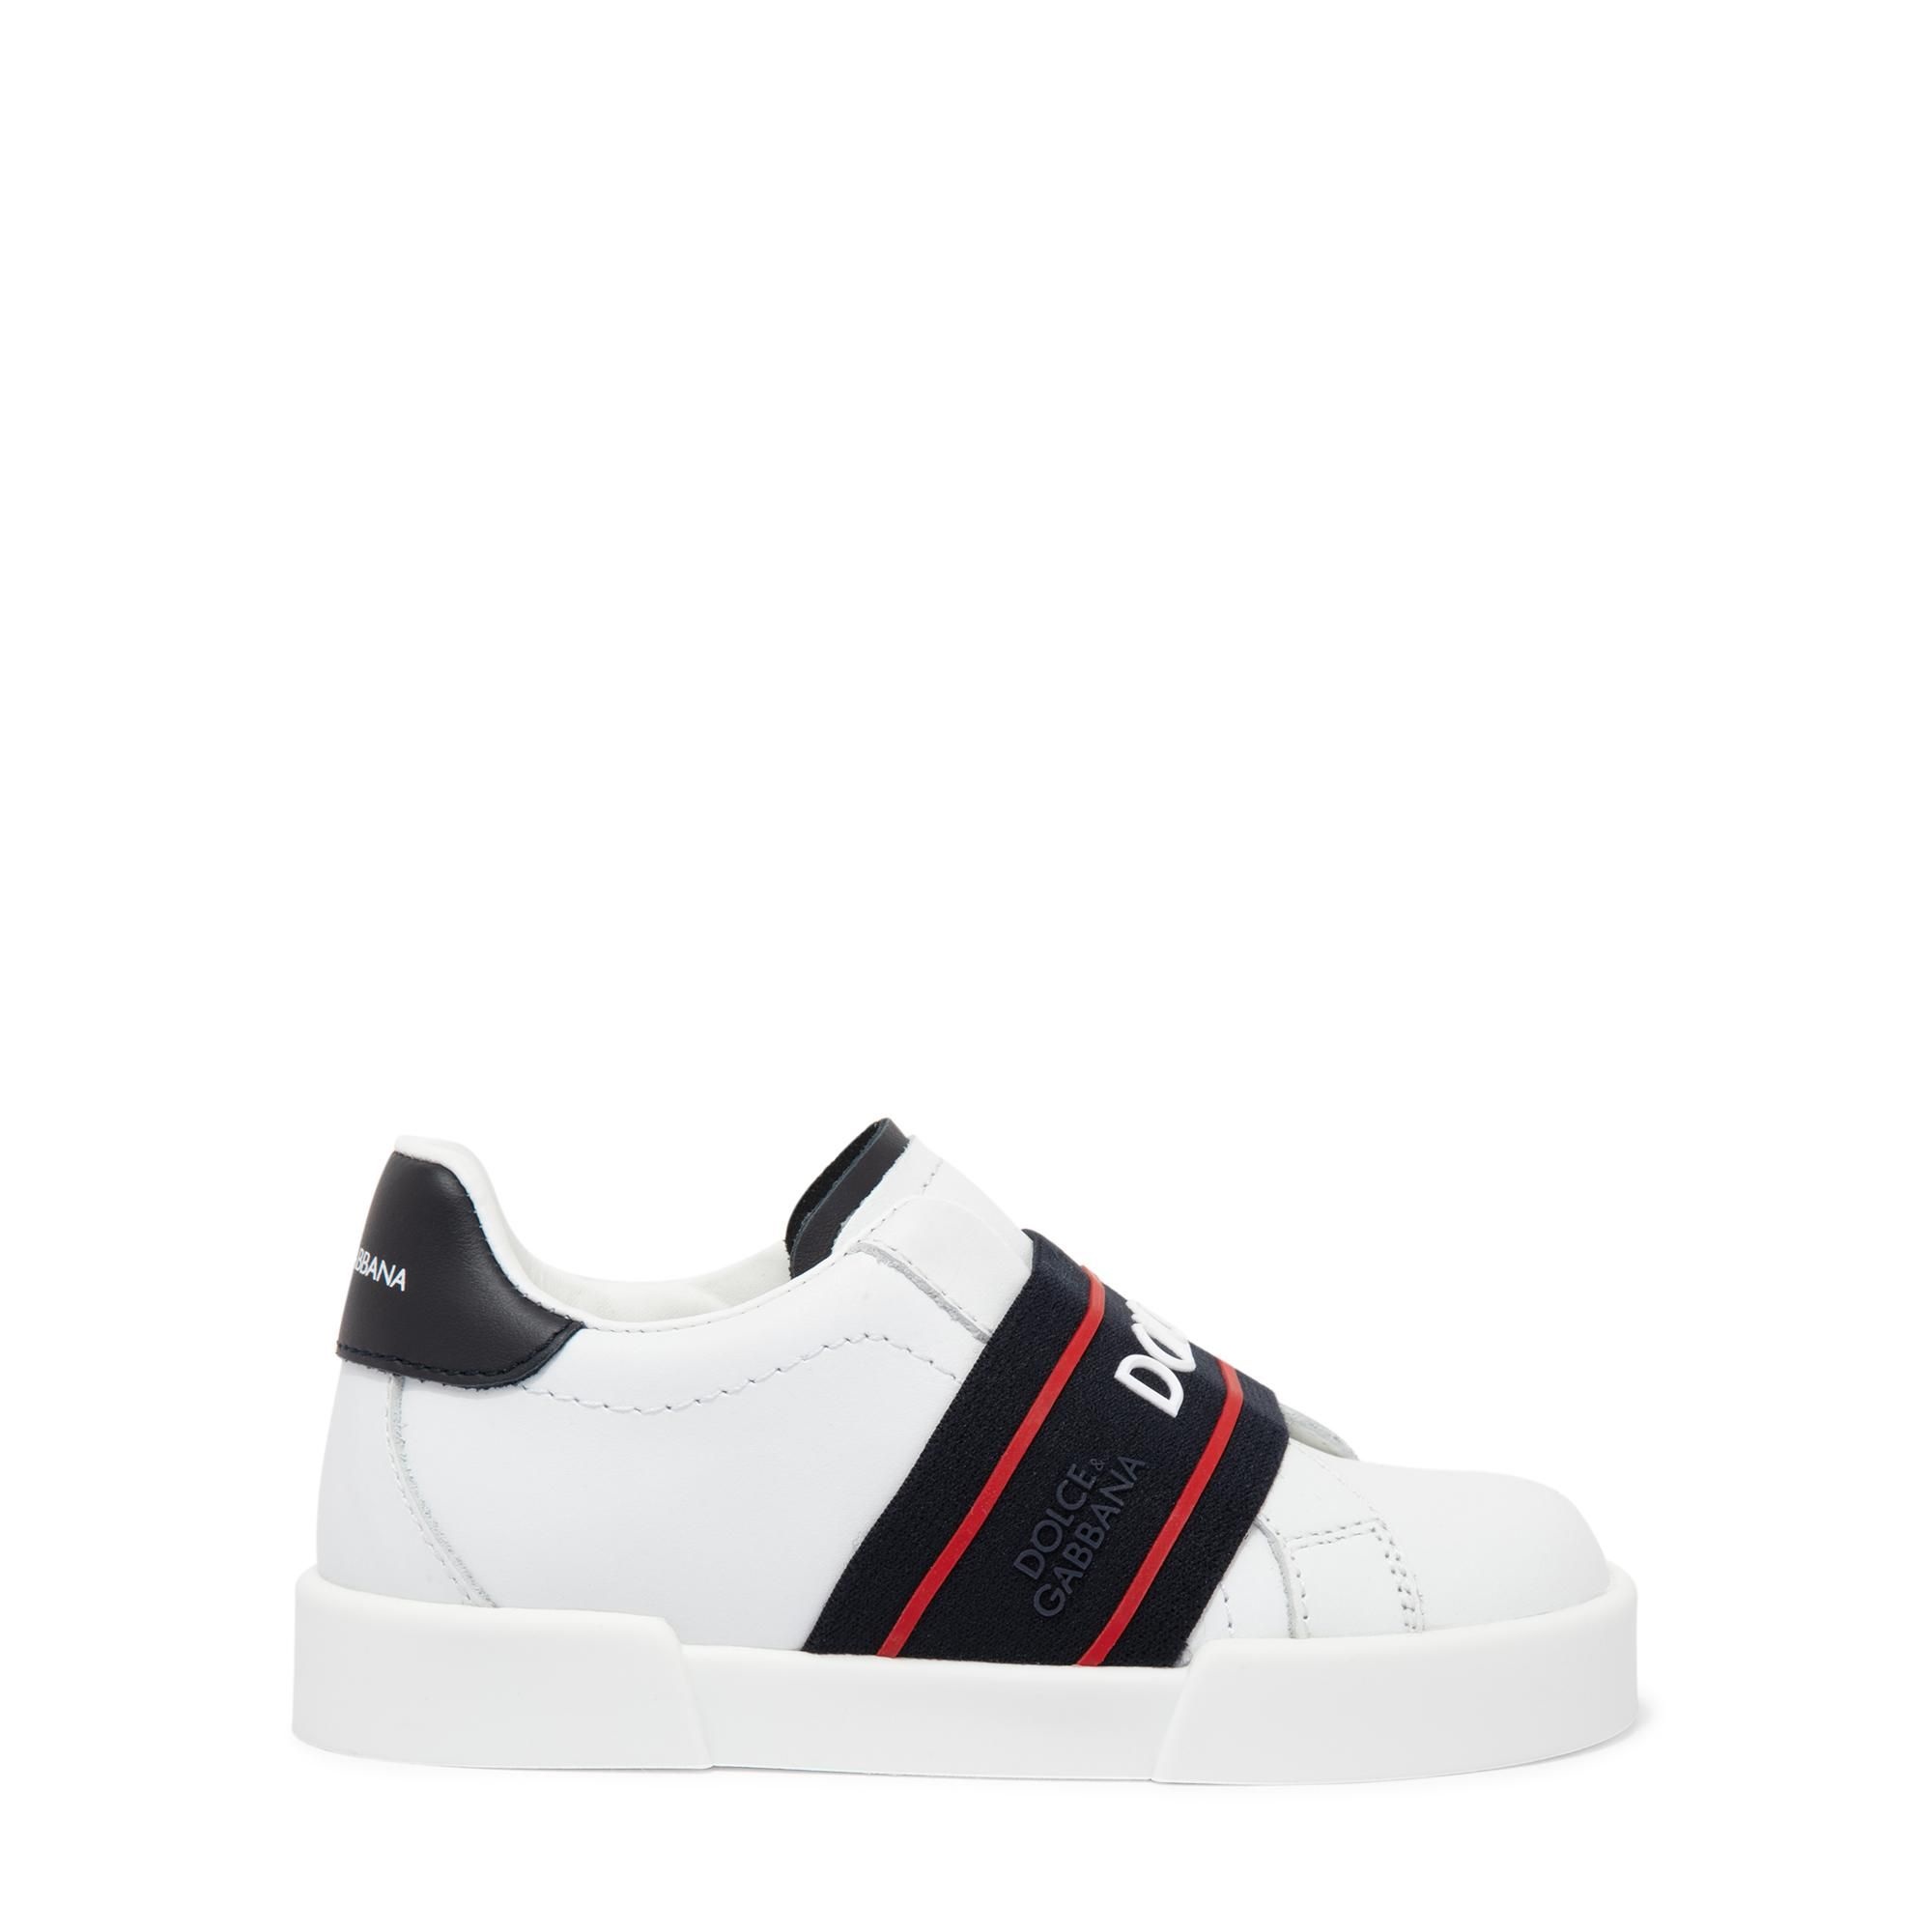 Calfskin portofino light sneakers with logo-detailed elastic